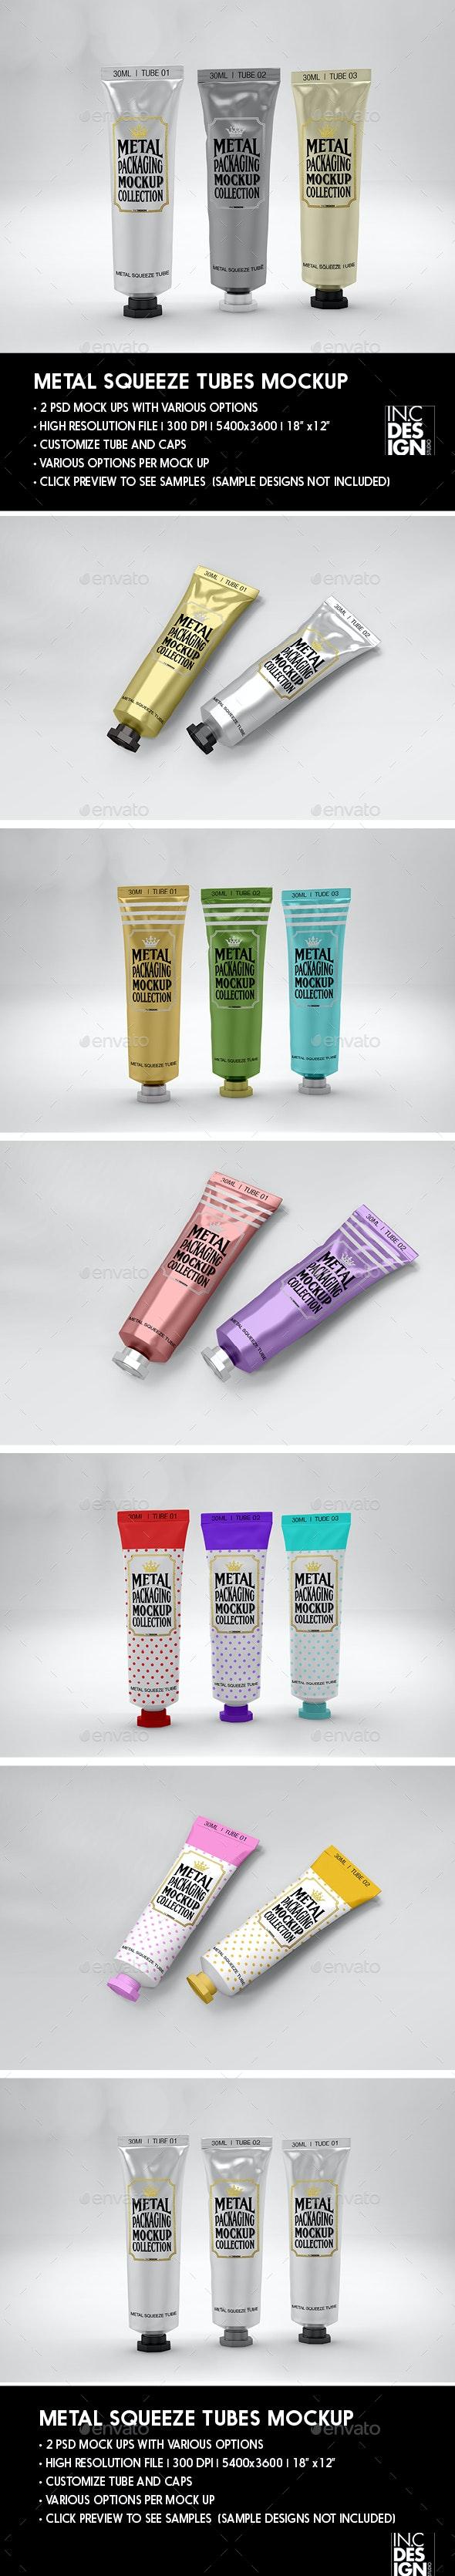 Metal Squeeze Tubes Packaging Mockup - Packaging Product Mock-Ups